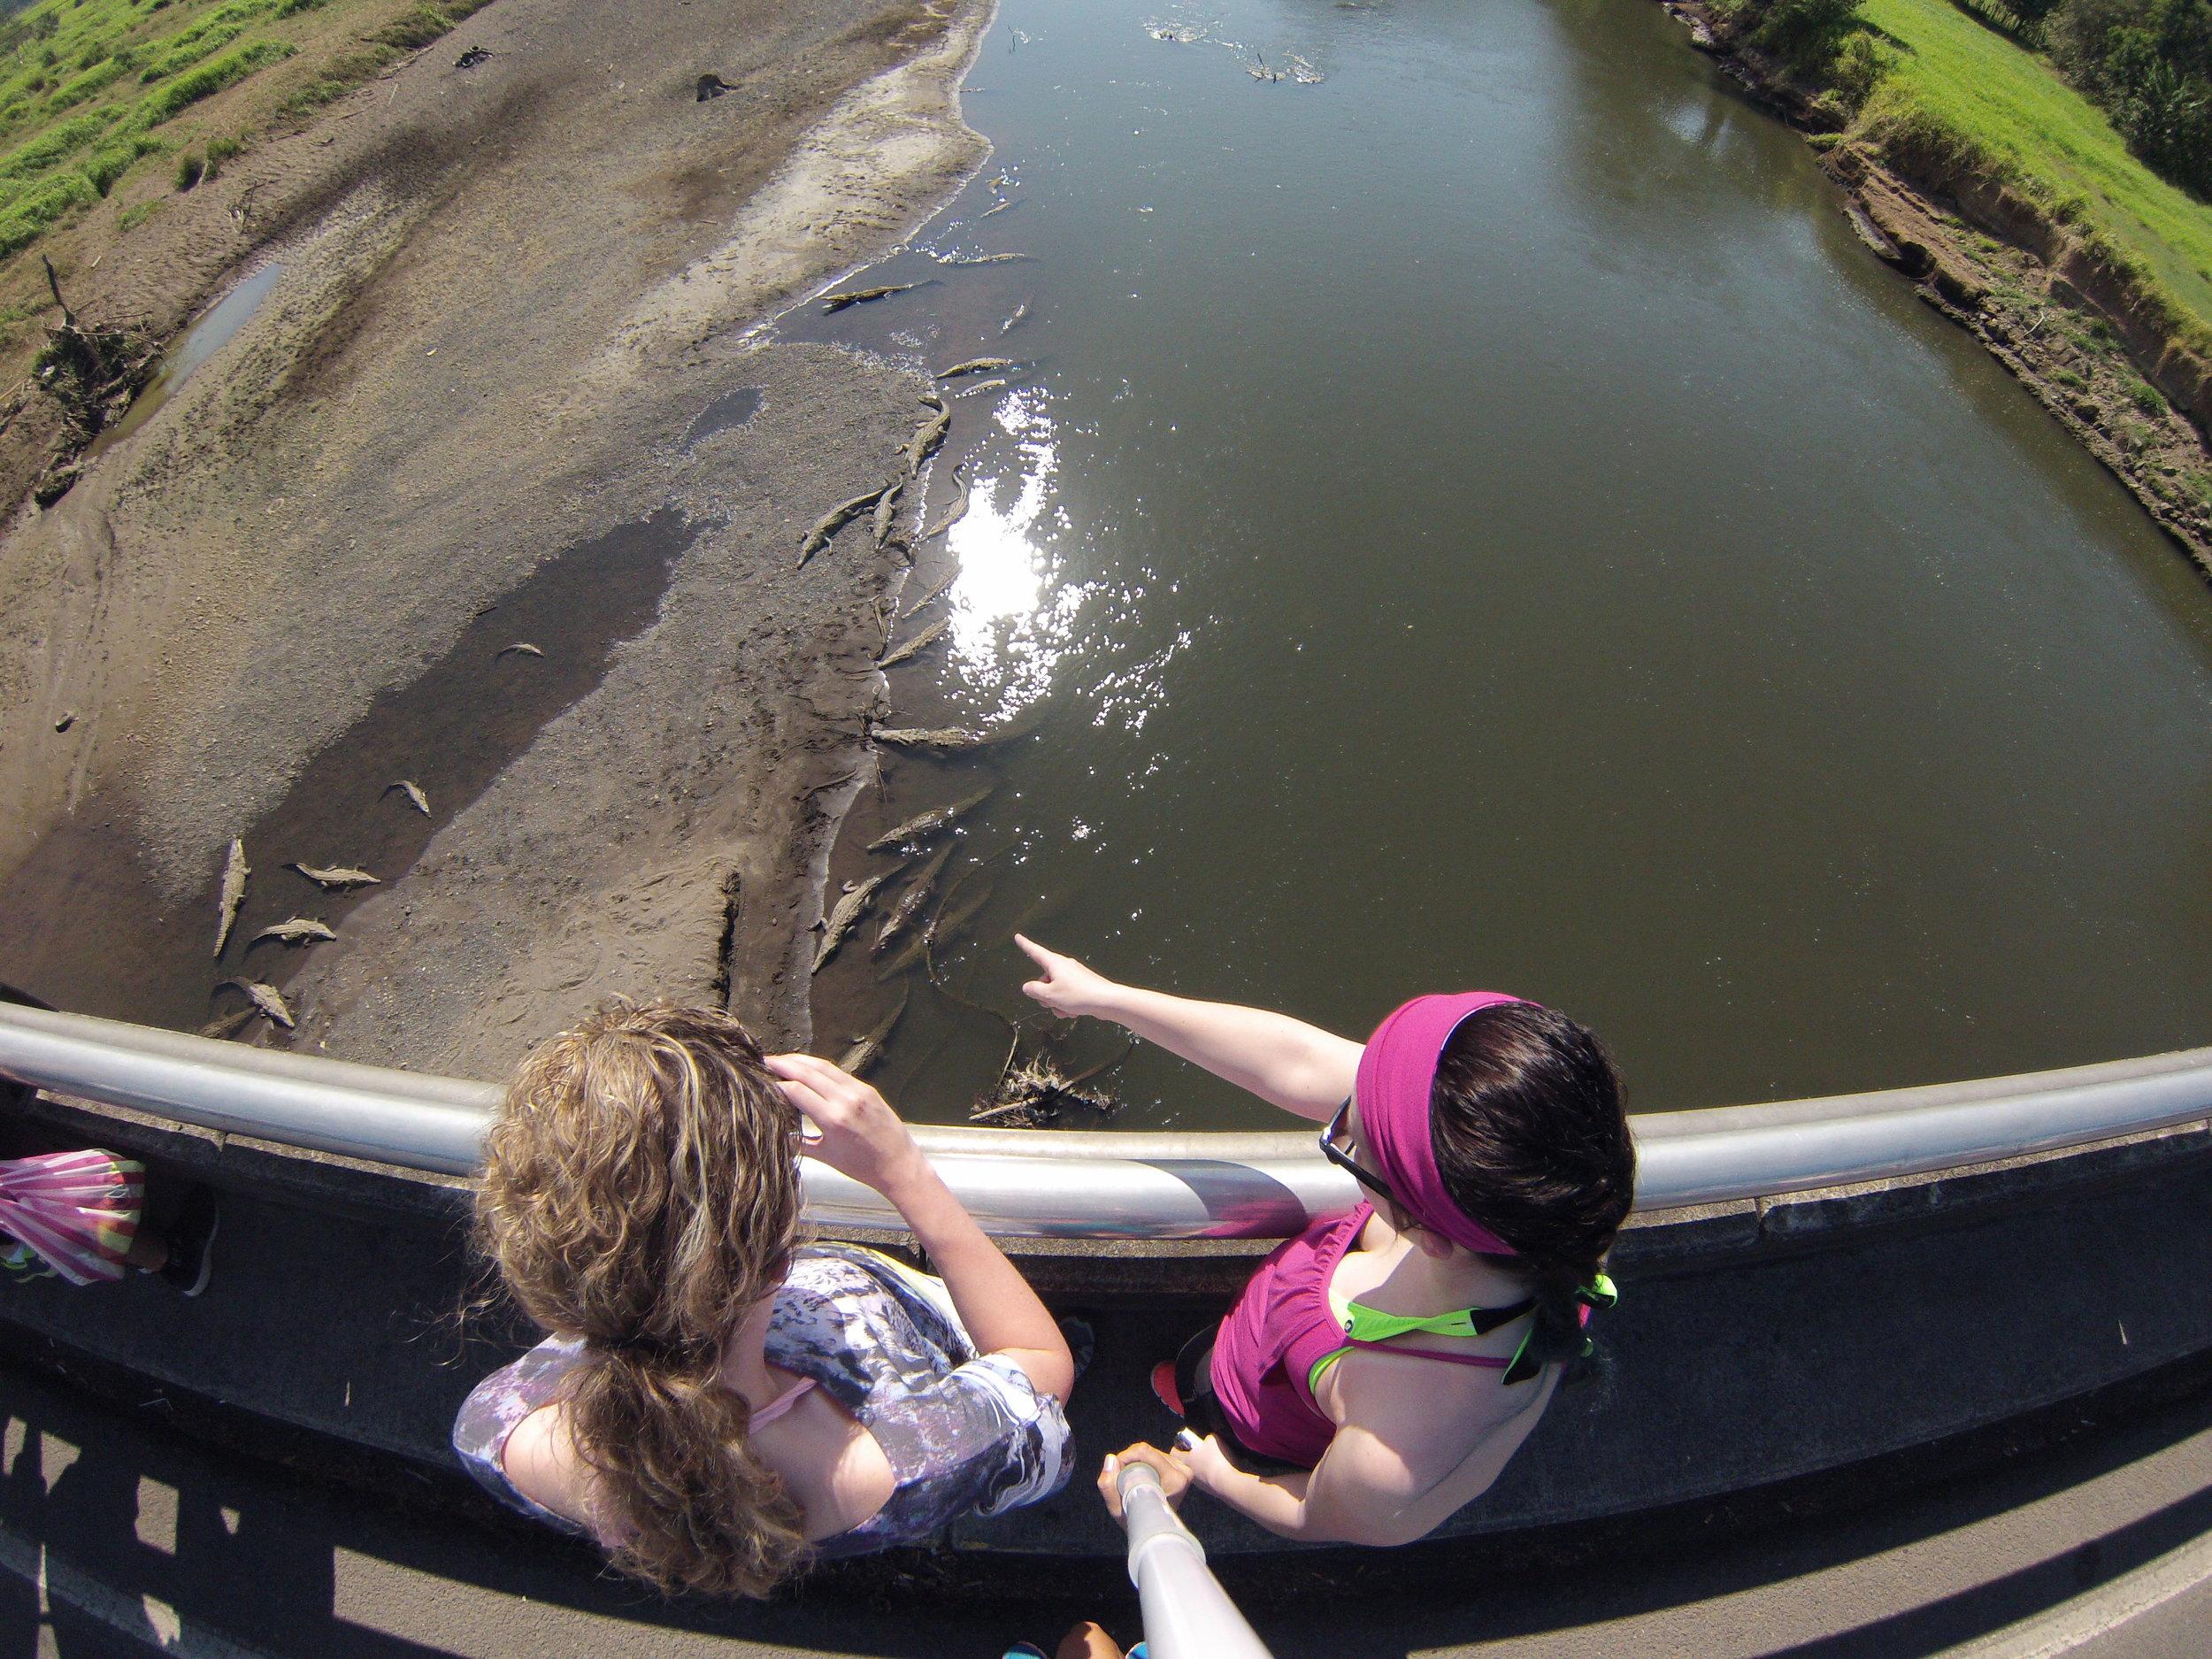 Crocodile & Bird watching tour - Enjoy of Costa Rica's main crocodile river